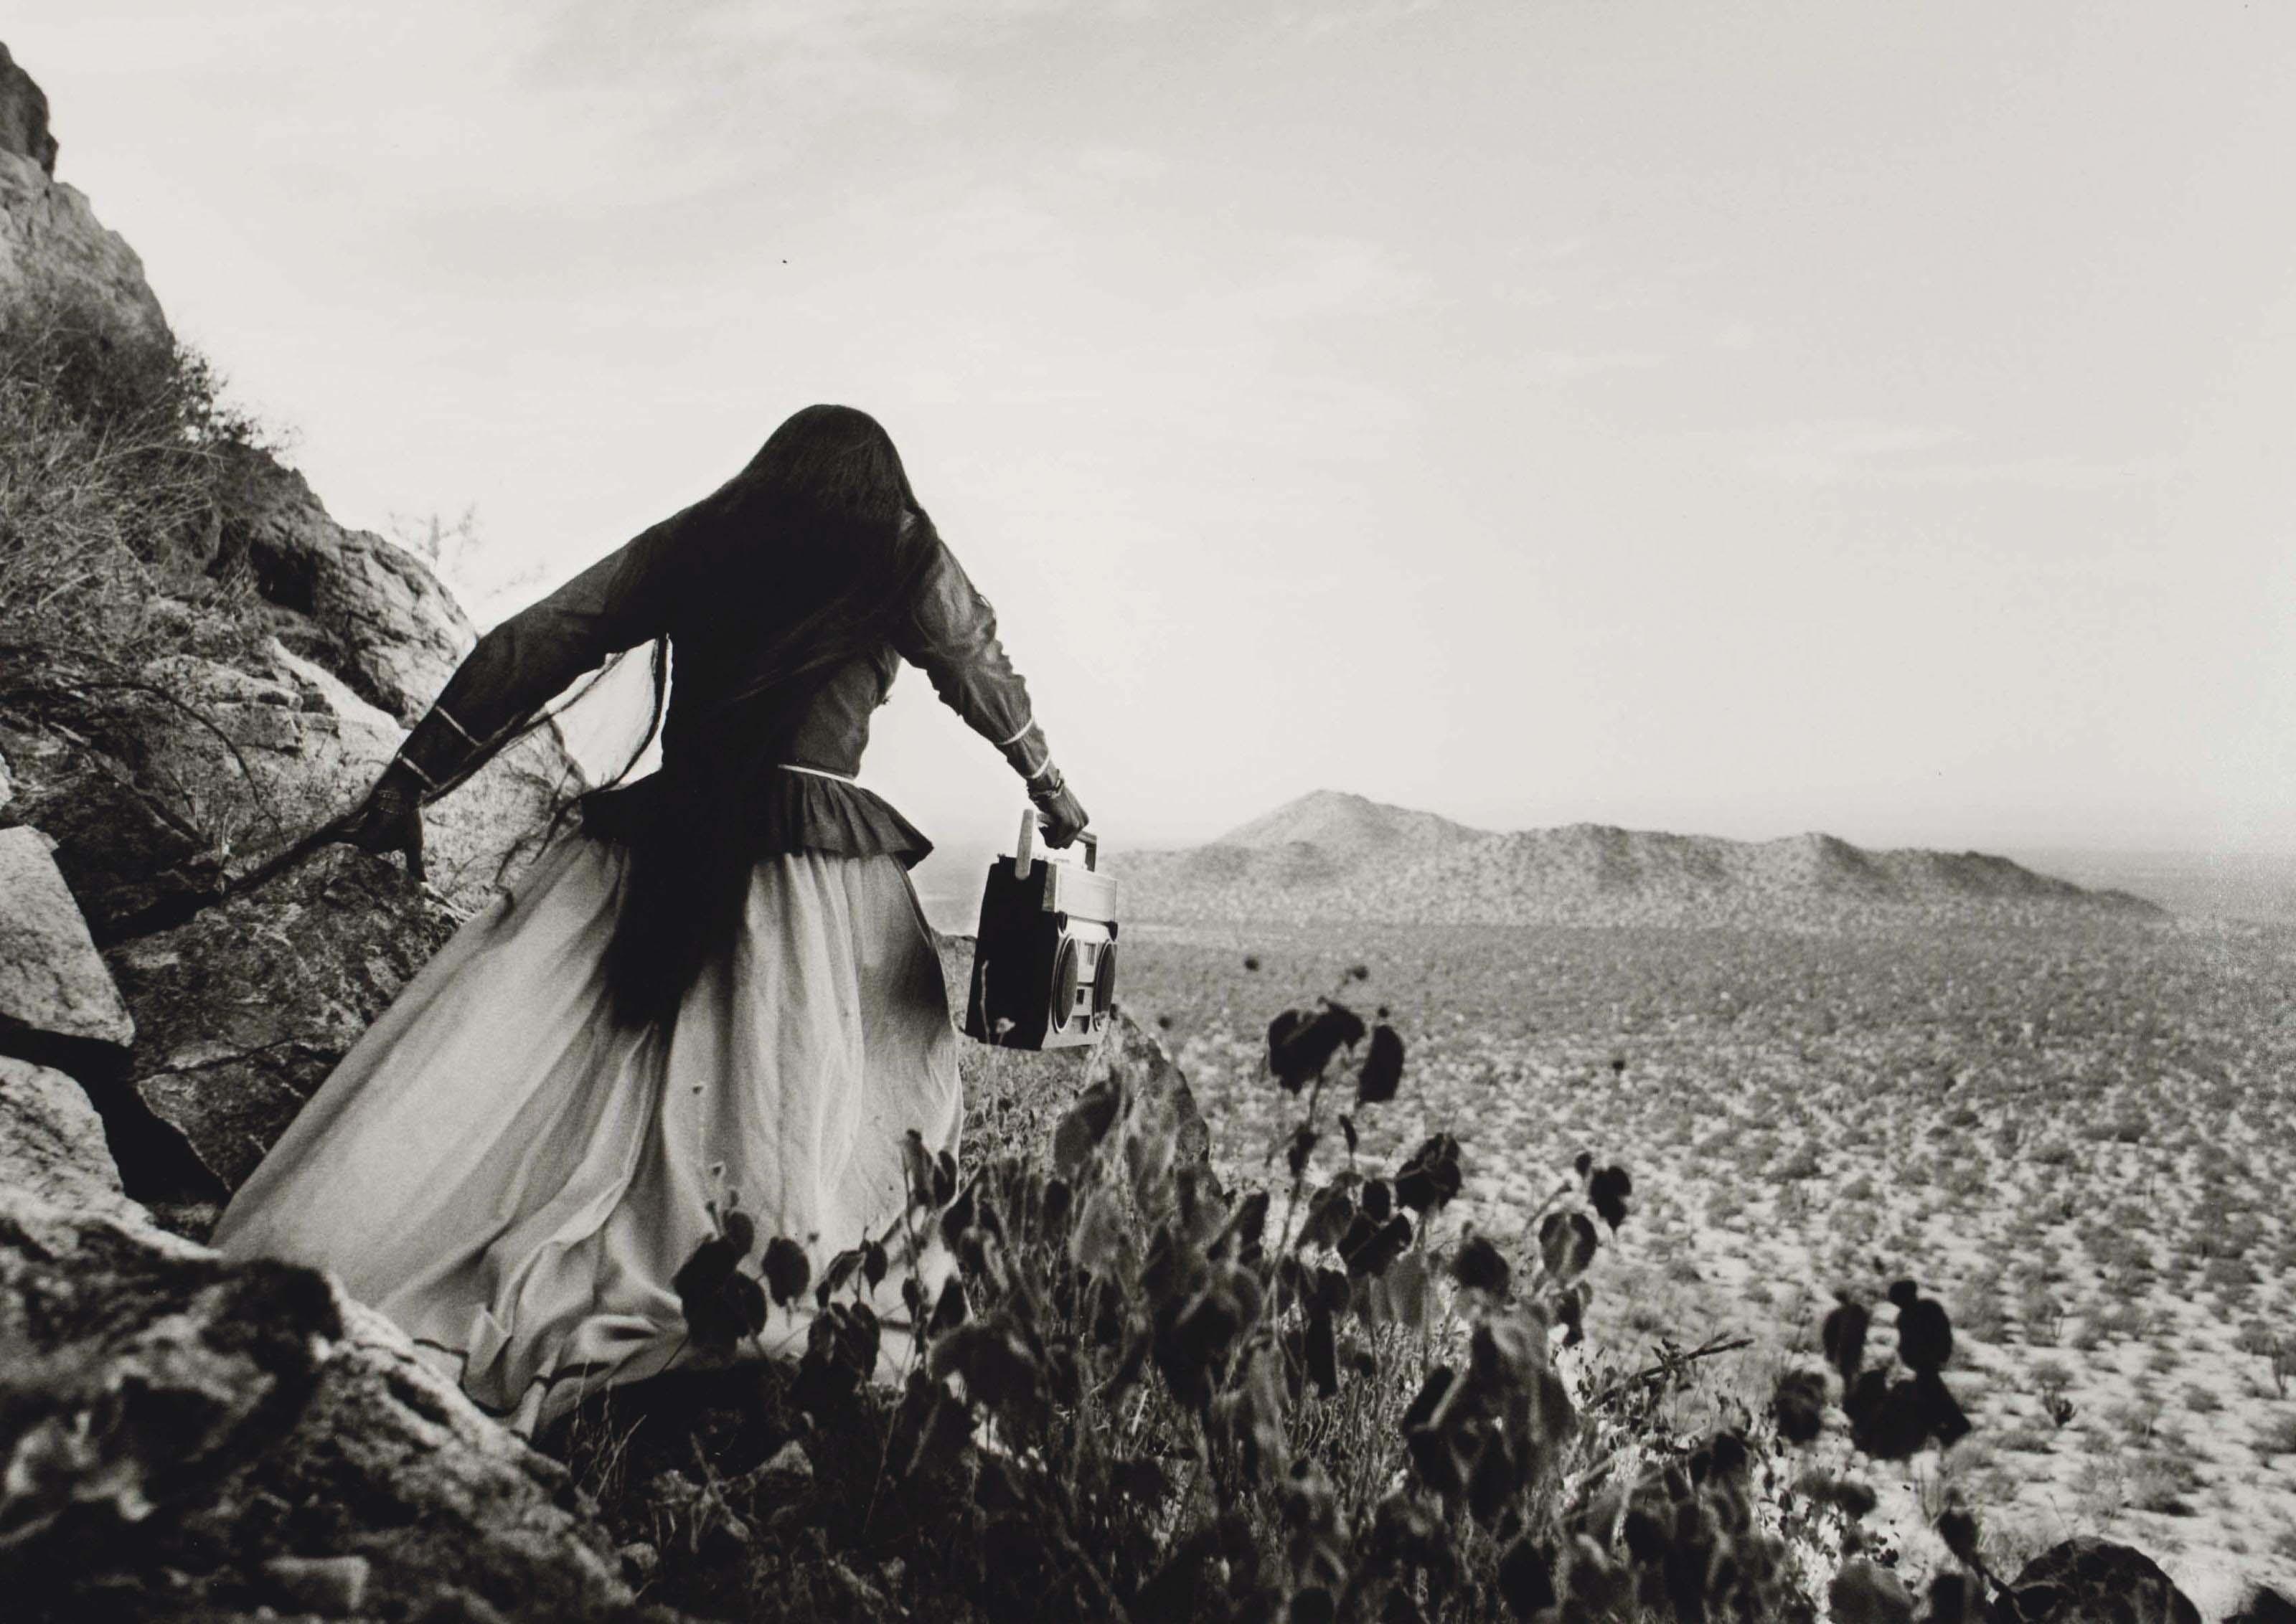 Mujer, Angel, Sonora Desert, 1979